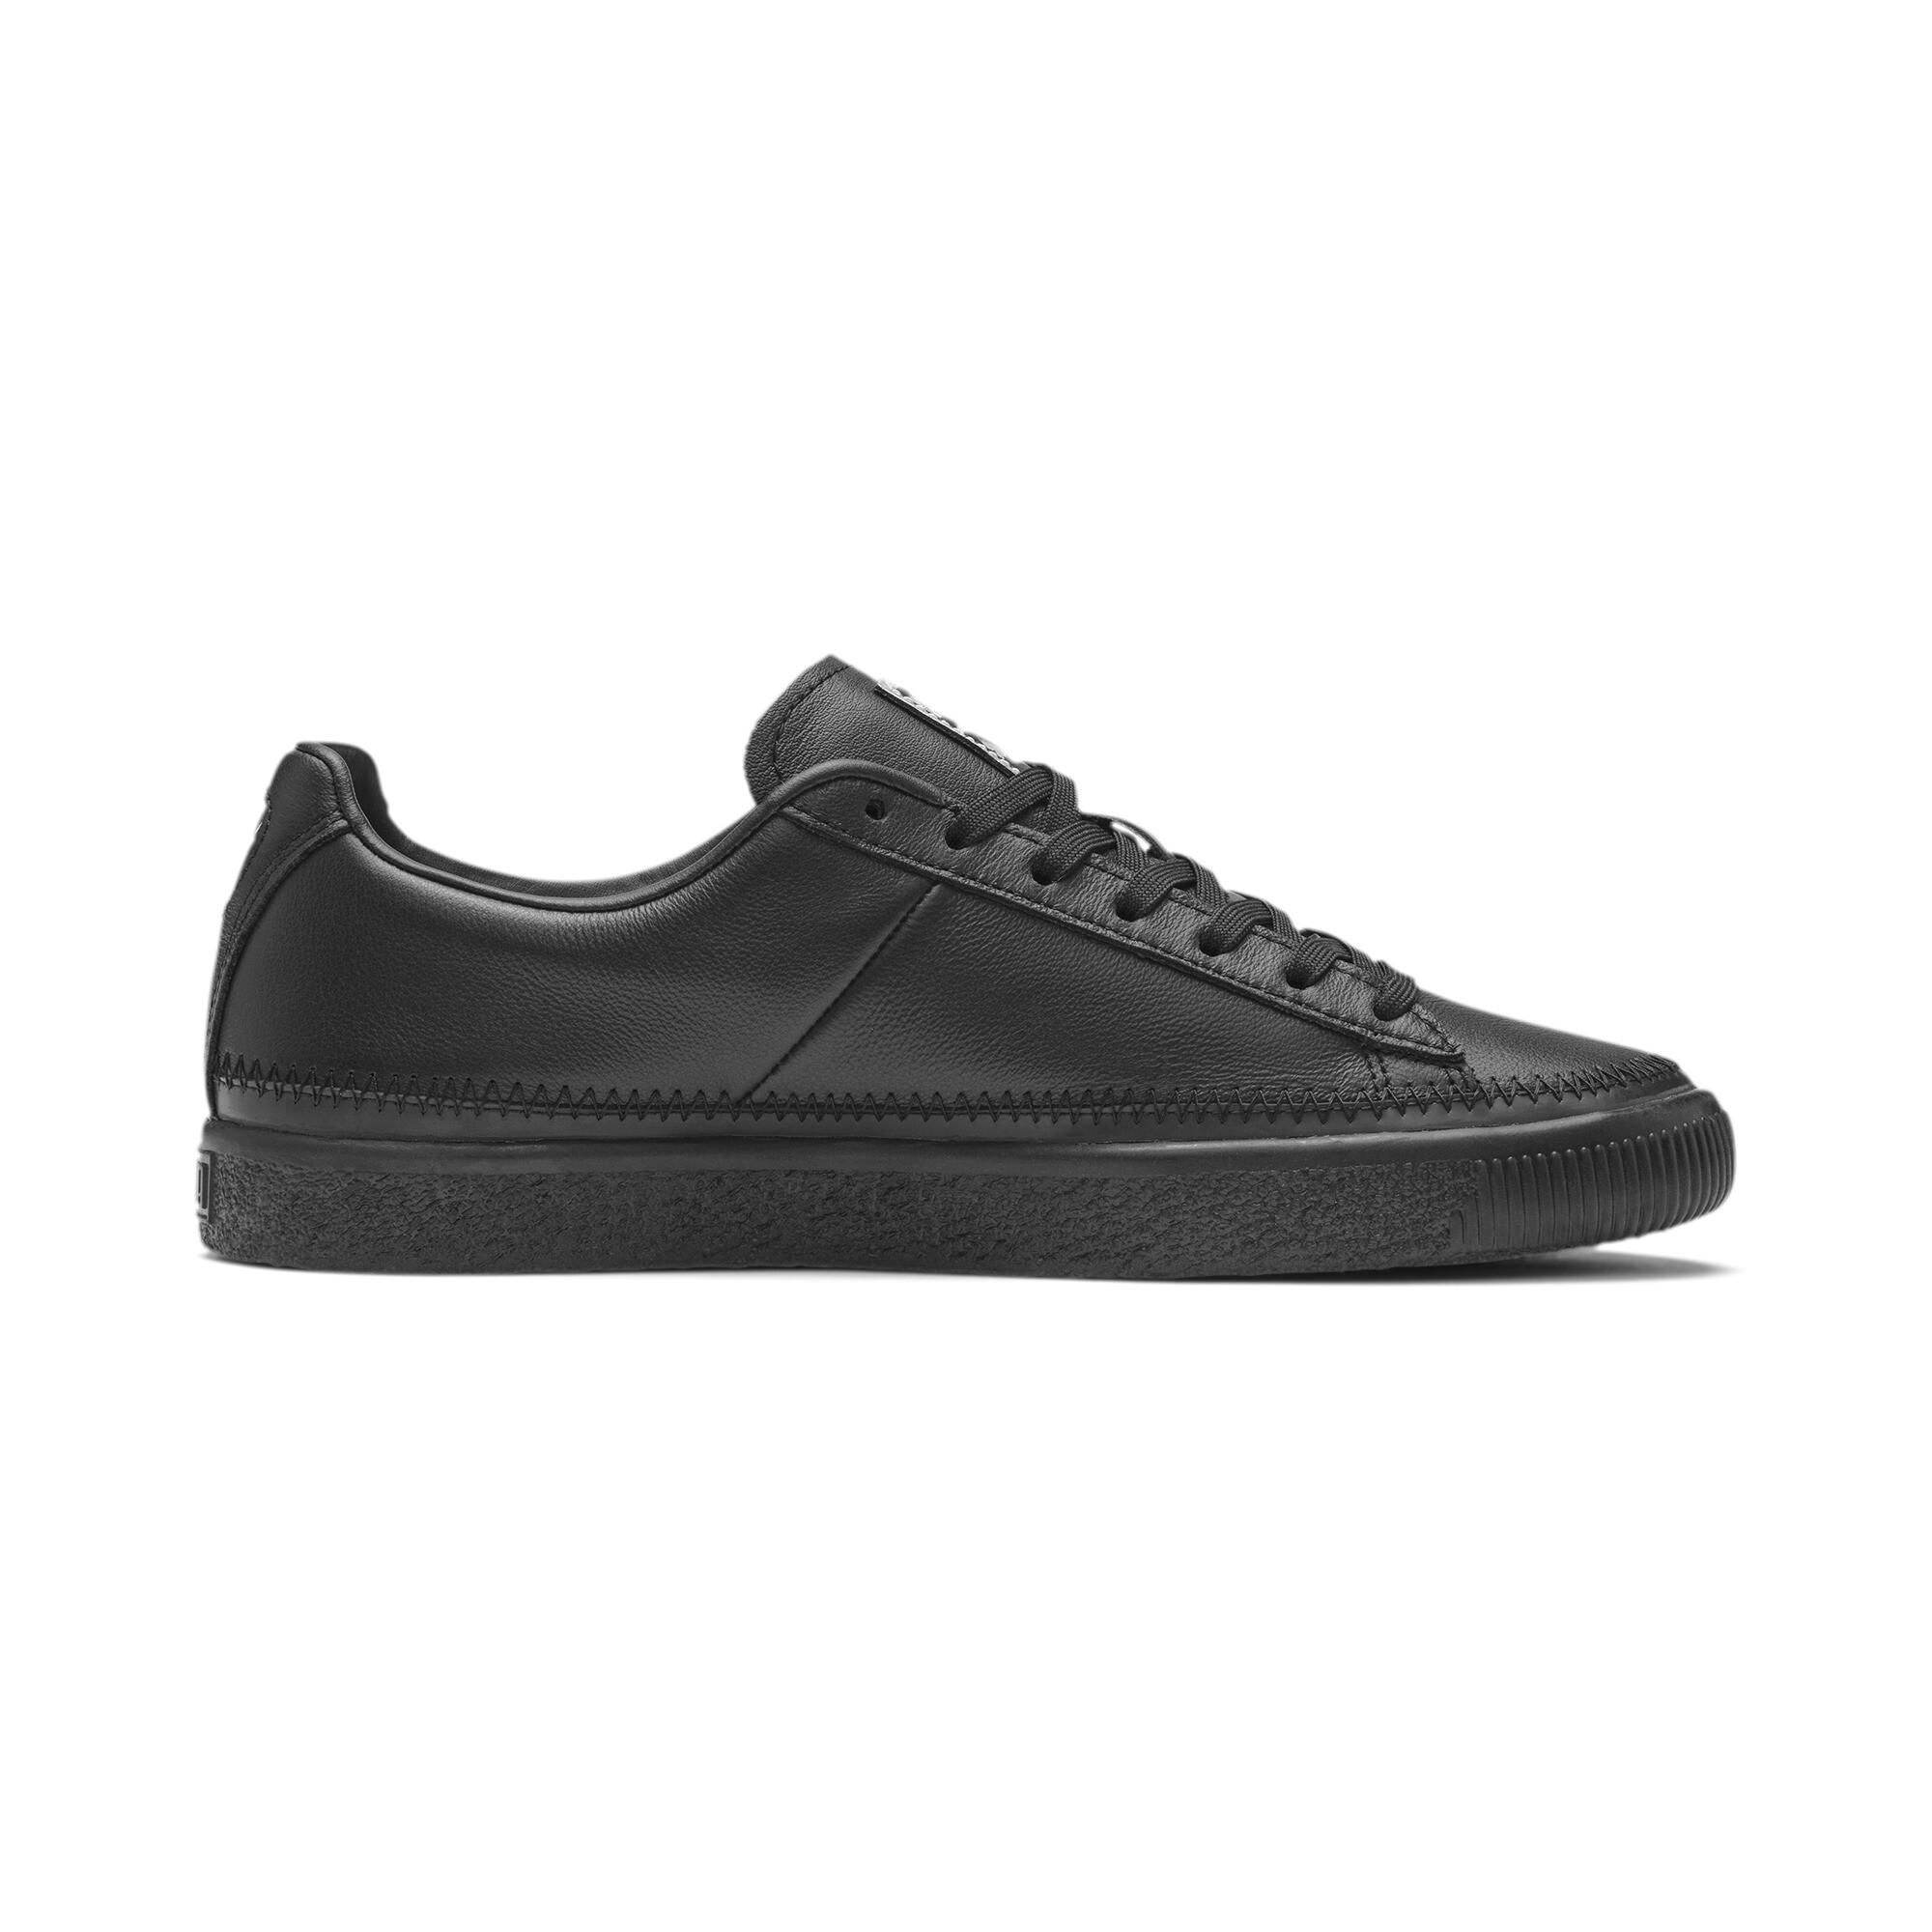 Indexbild 12 - PUMA Basket Stitch Sneaker Unisex Schuhe Neu